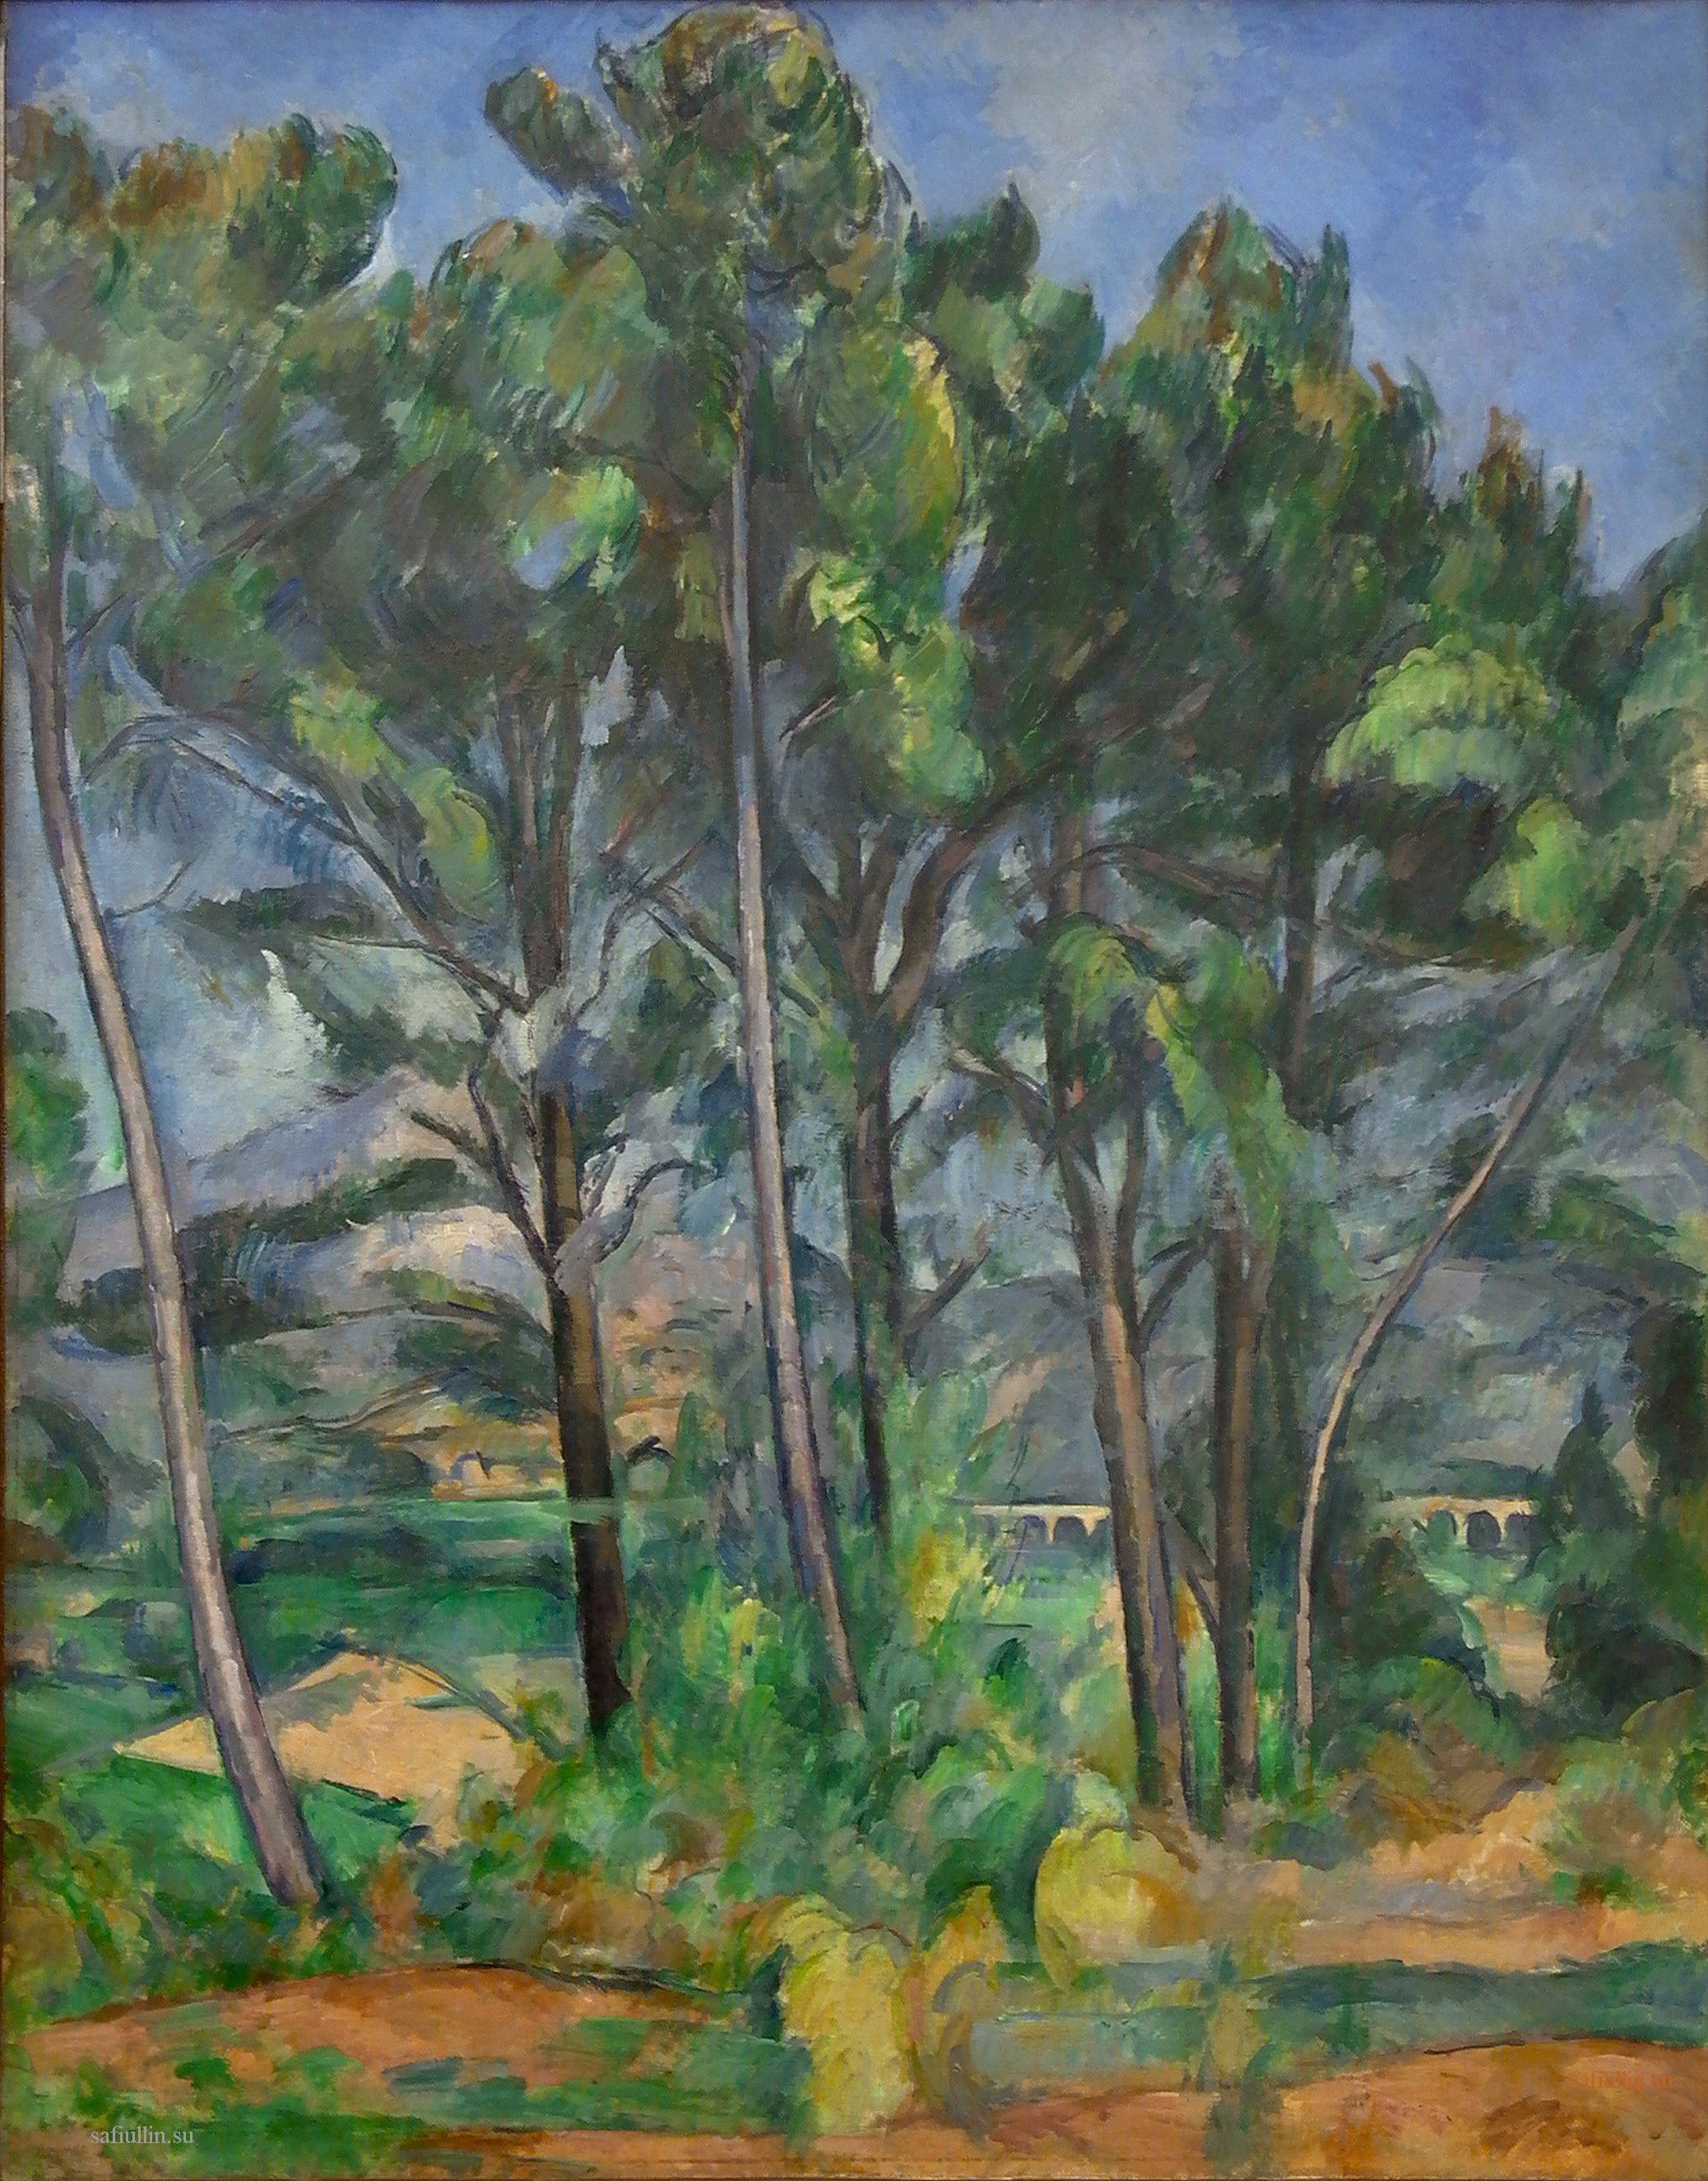 Сезанн картина Sainte Victoire пейзажи природы Сафиуллин